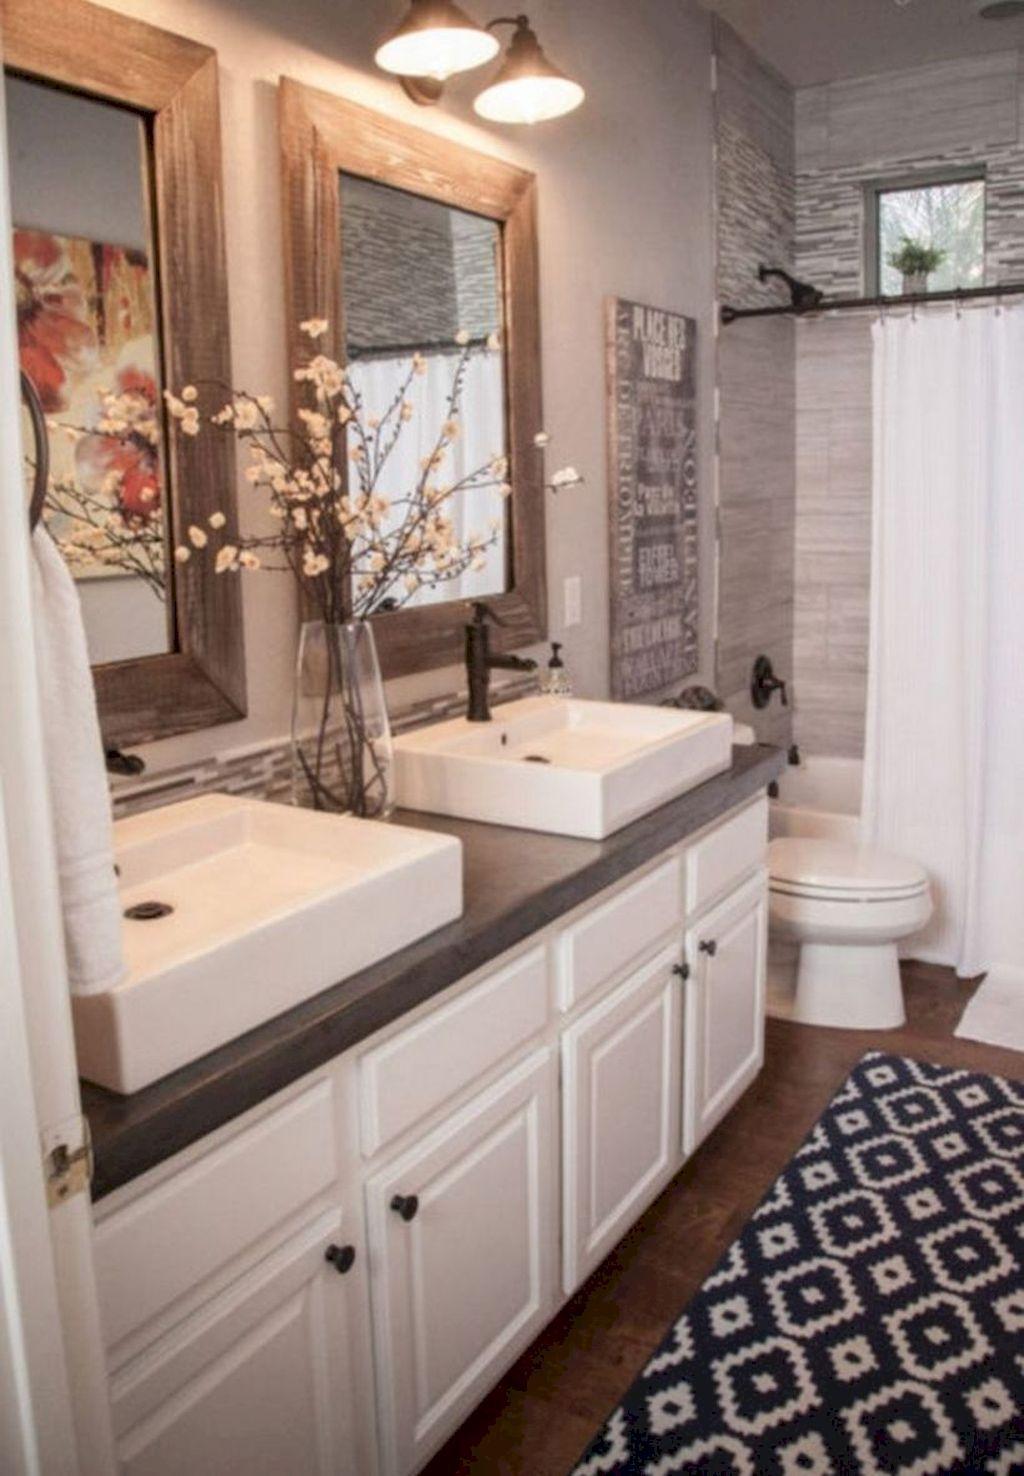 125 Brilliant Farmhouse Bathroom Vanity Remodel Ideas Bathroom Vanity Decor Modern Farmhouse Bathroom